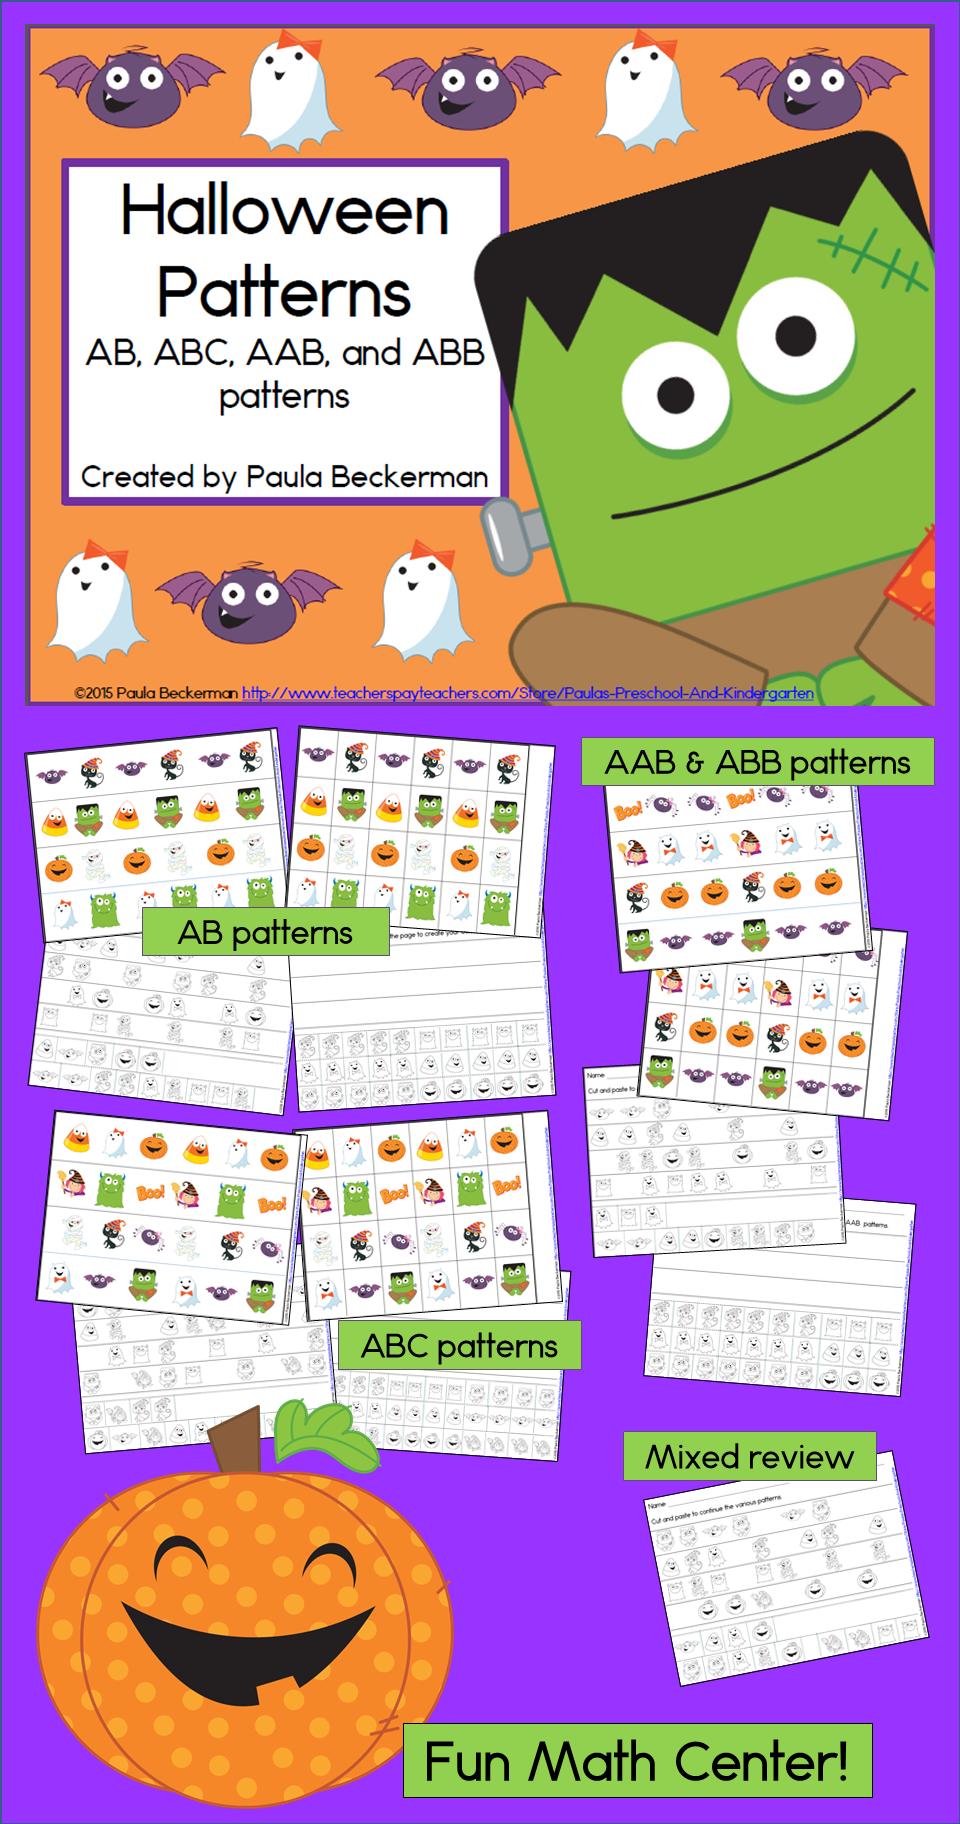 Halloween Math Center With Ab Abc Aab And Abb Patterns Halloween Math Centers Math Patterns Activities Halloween Math [ 1824 x 960 Pixel ]